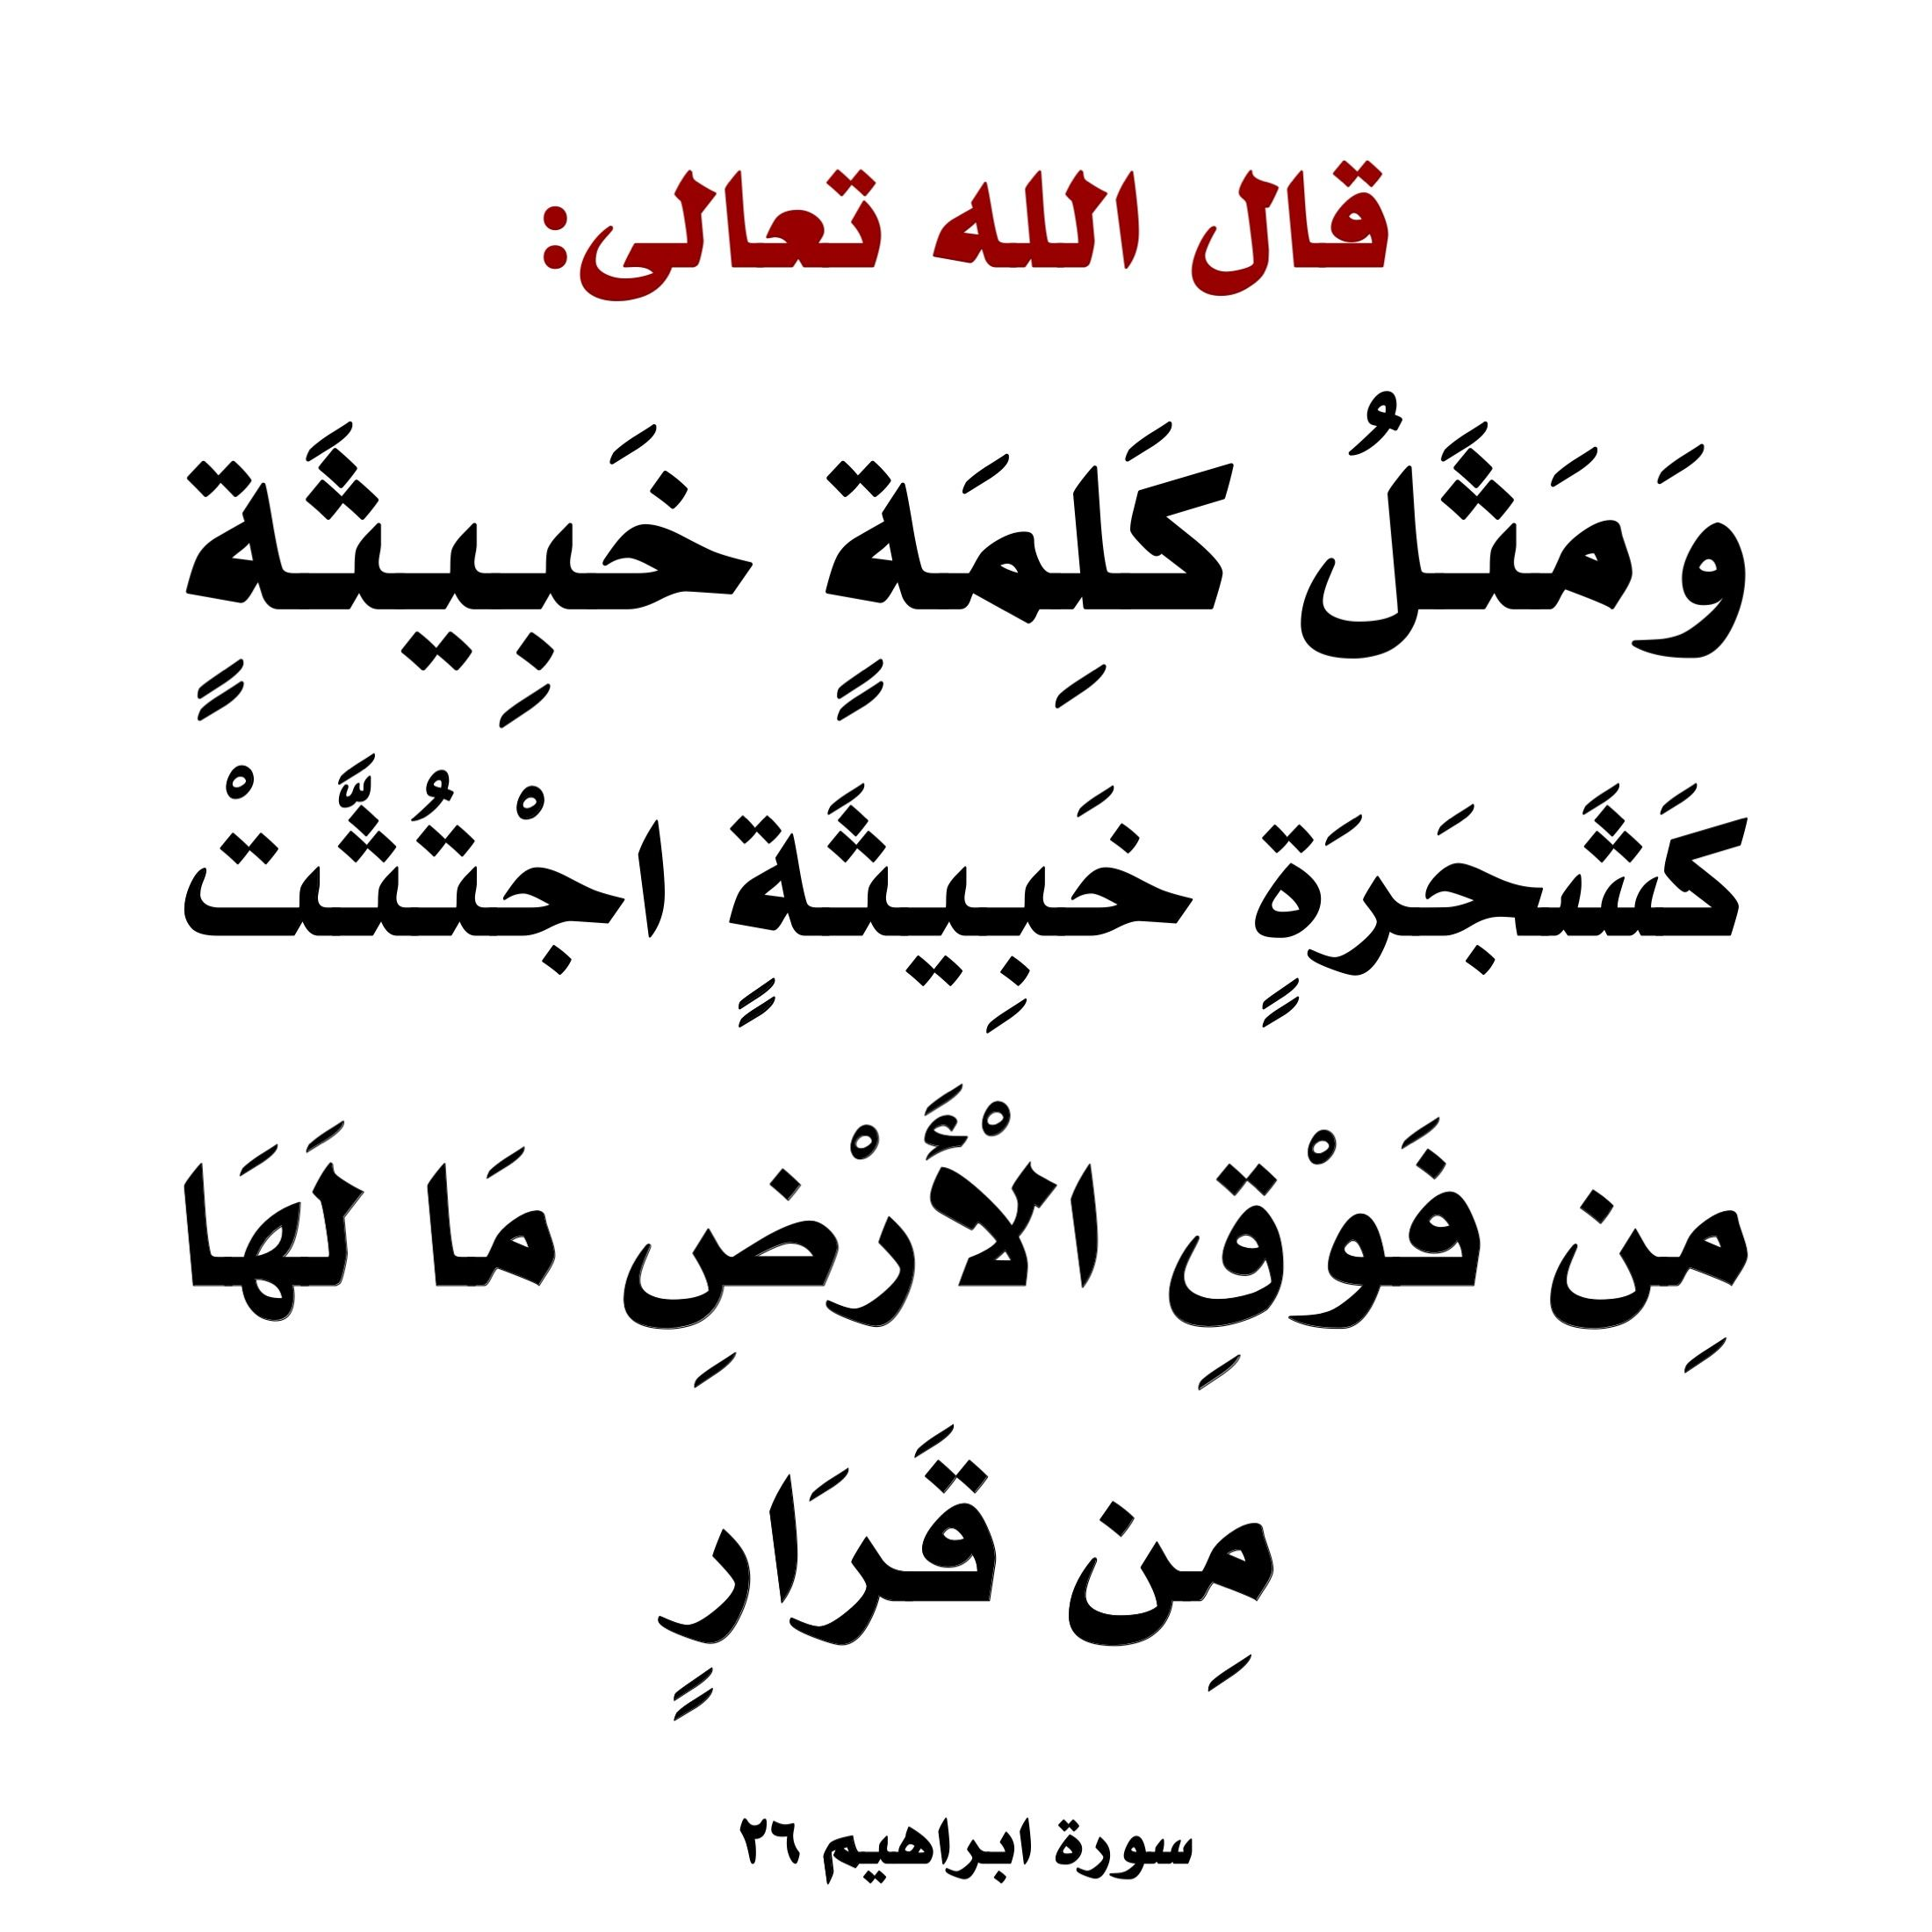 Pin By الأثر الجميل On آيات من القرآن الكريم In 2021 Pdf Books Arabic Calligraphy Books